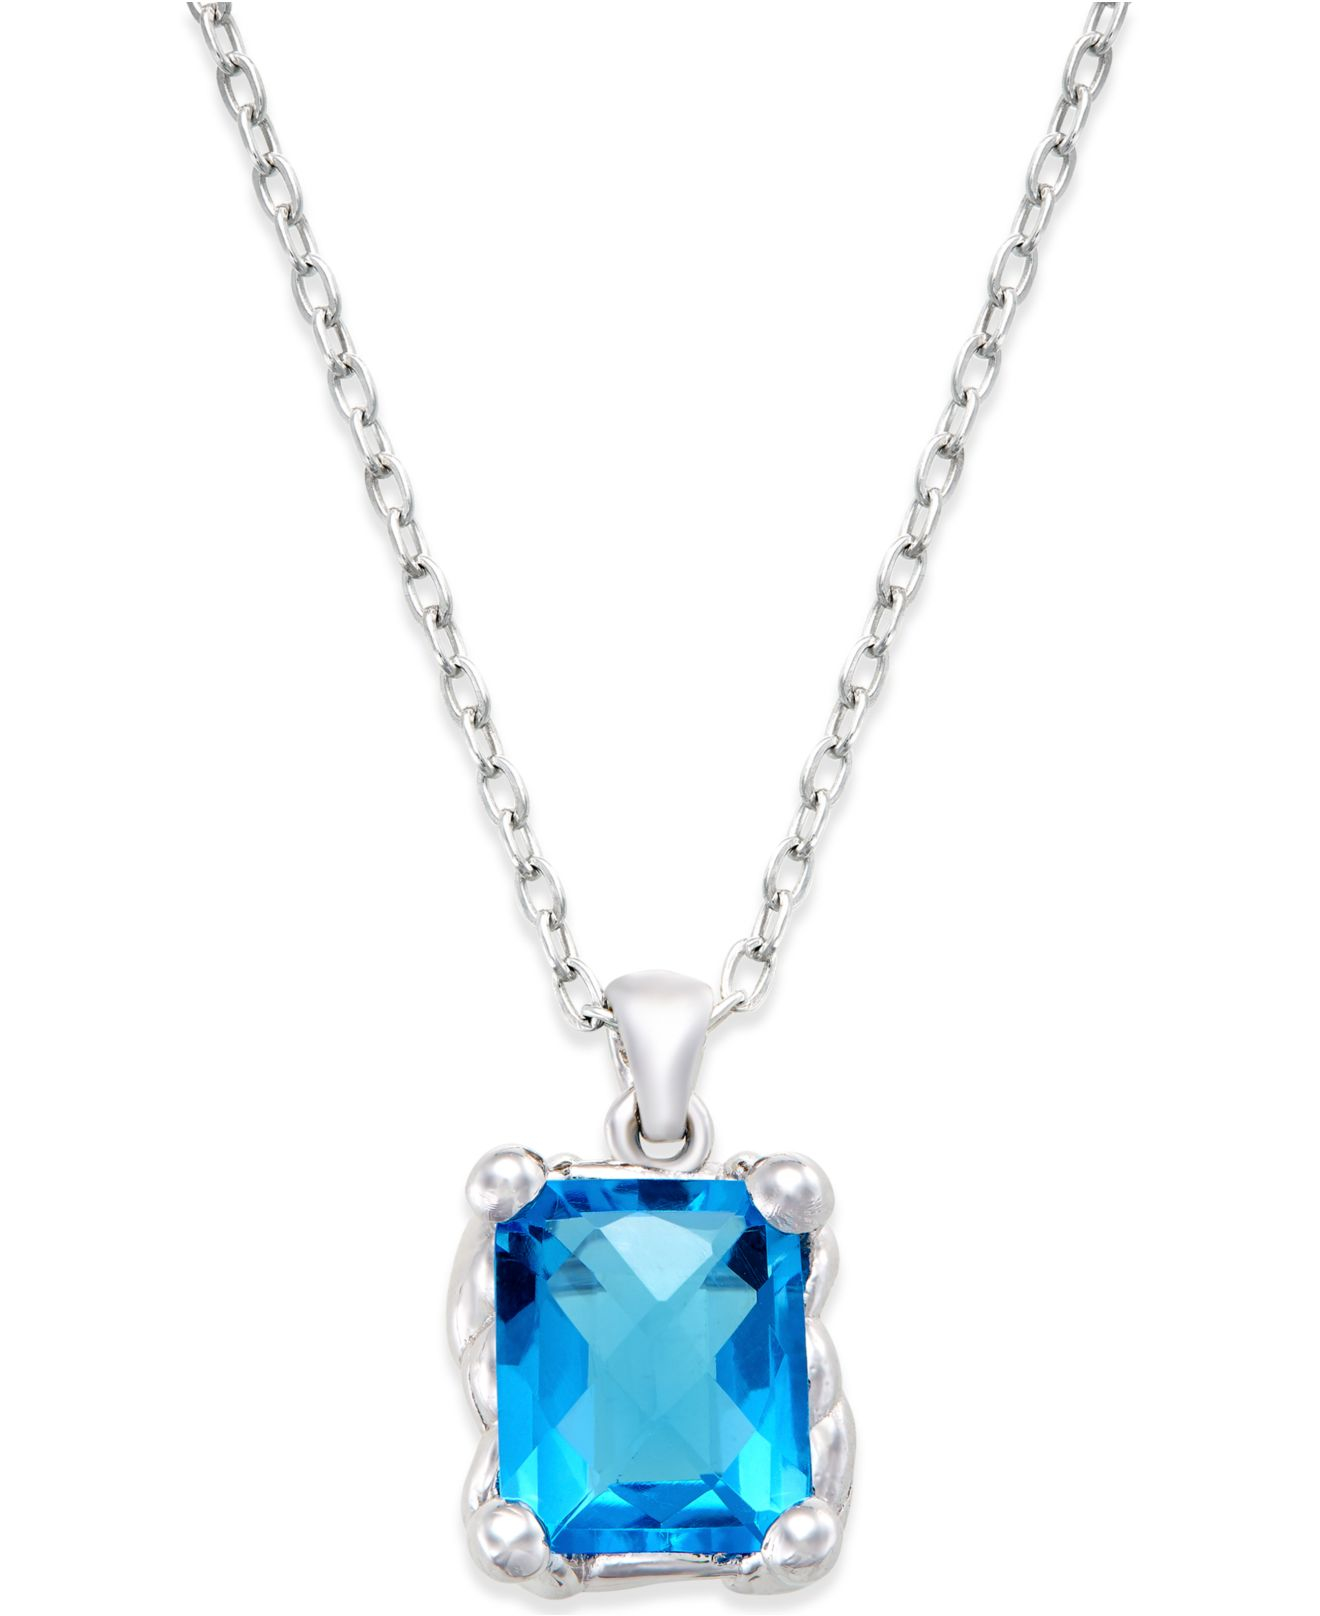 macy s blue quartz pendant necklace 7 ct t w in